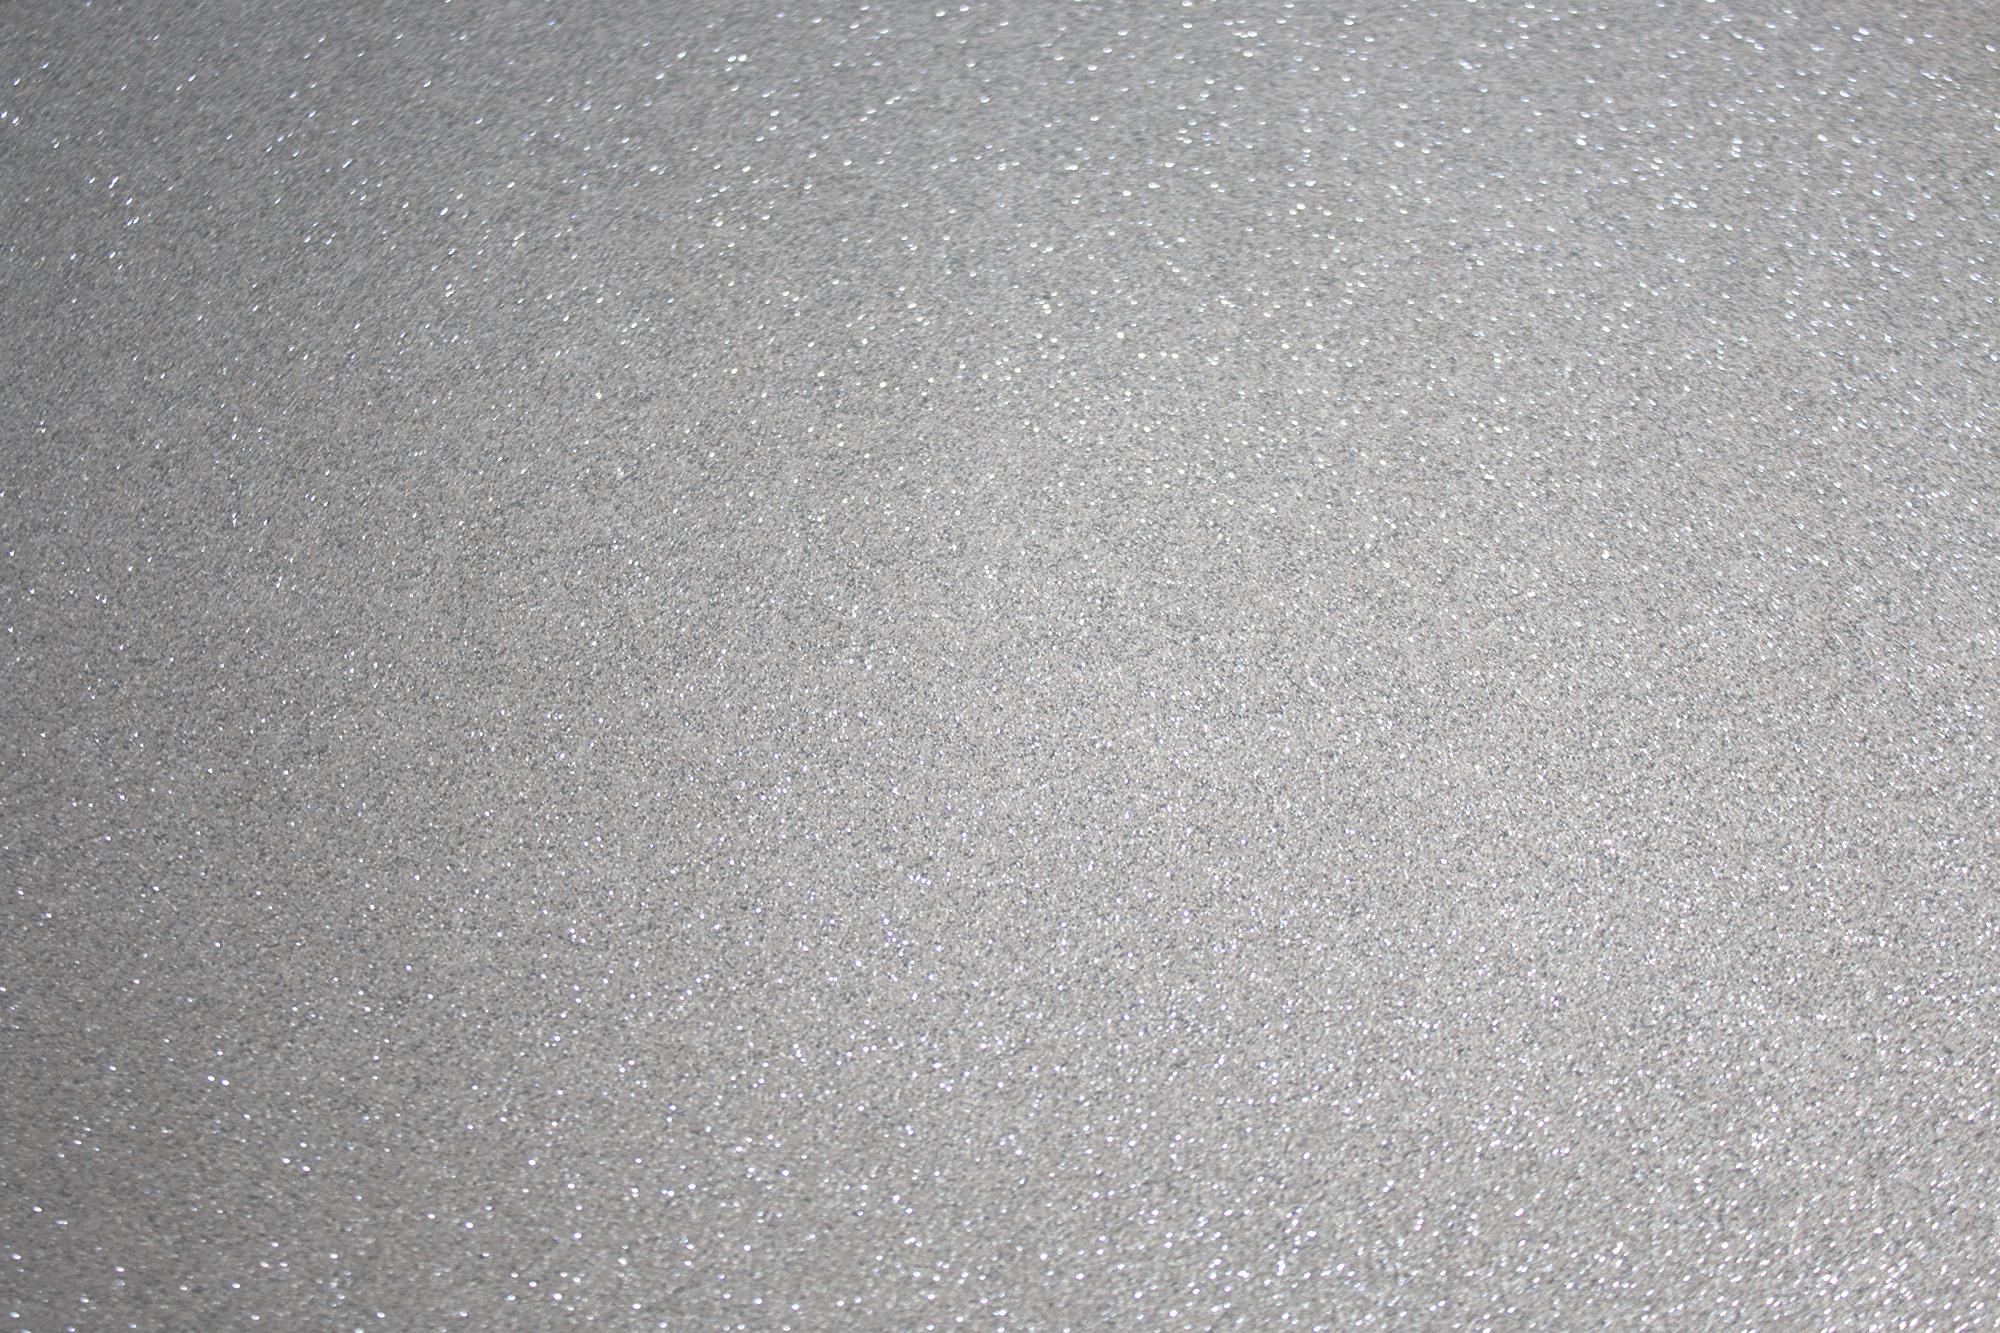 Glitter Vinyl Silver Sew Sweetness Download 20,000+ royalty free silver glitter vector images. glitter vinyl silver